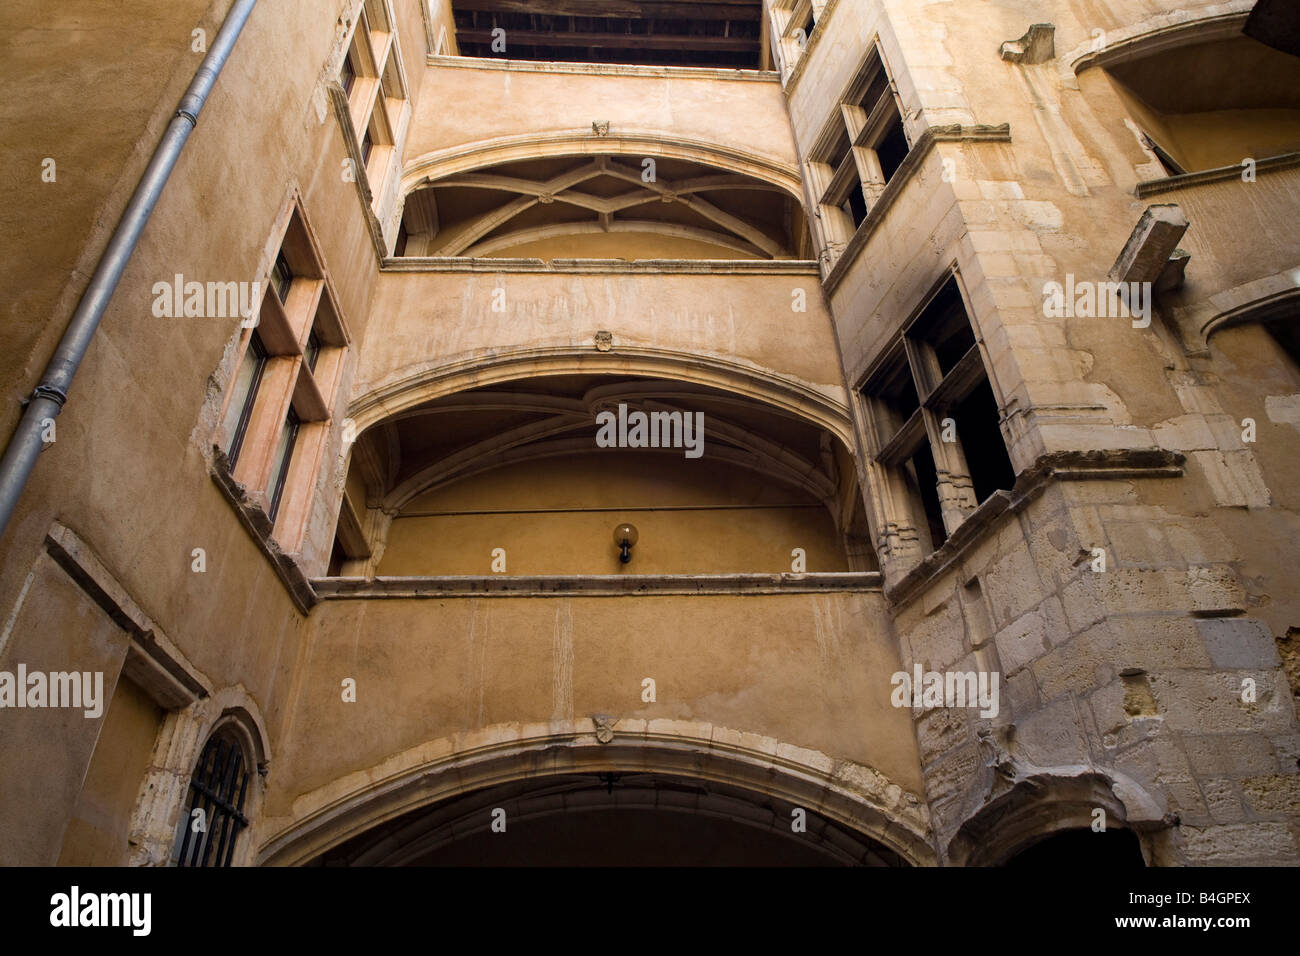 Lyon,  28 rue Saint-Jean, Treppentürme und Laubengänge - sogenannte Traboules - Stock Image